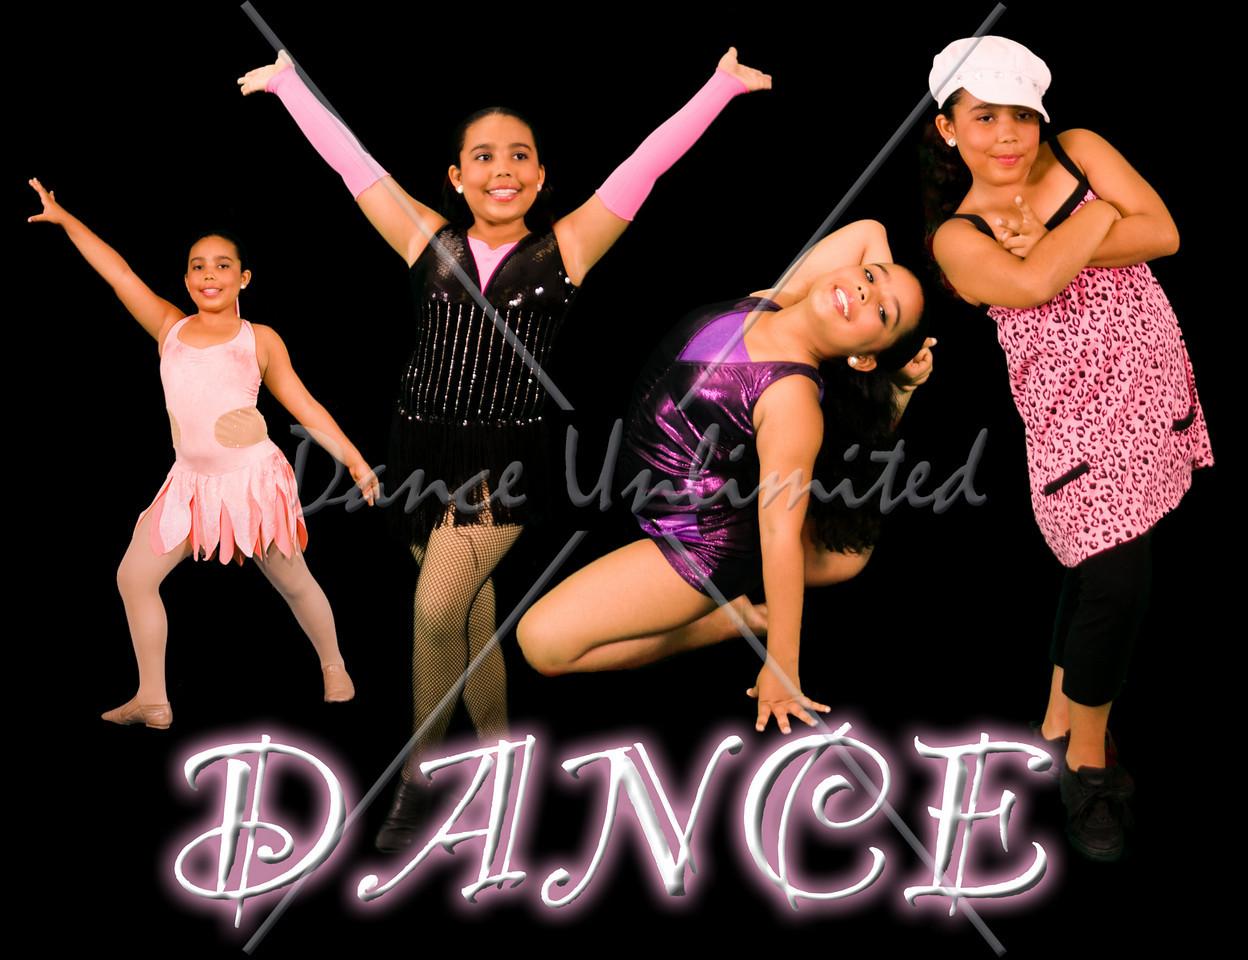 Jayda Dance Montage